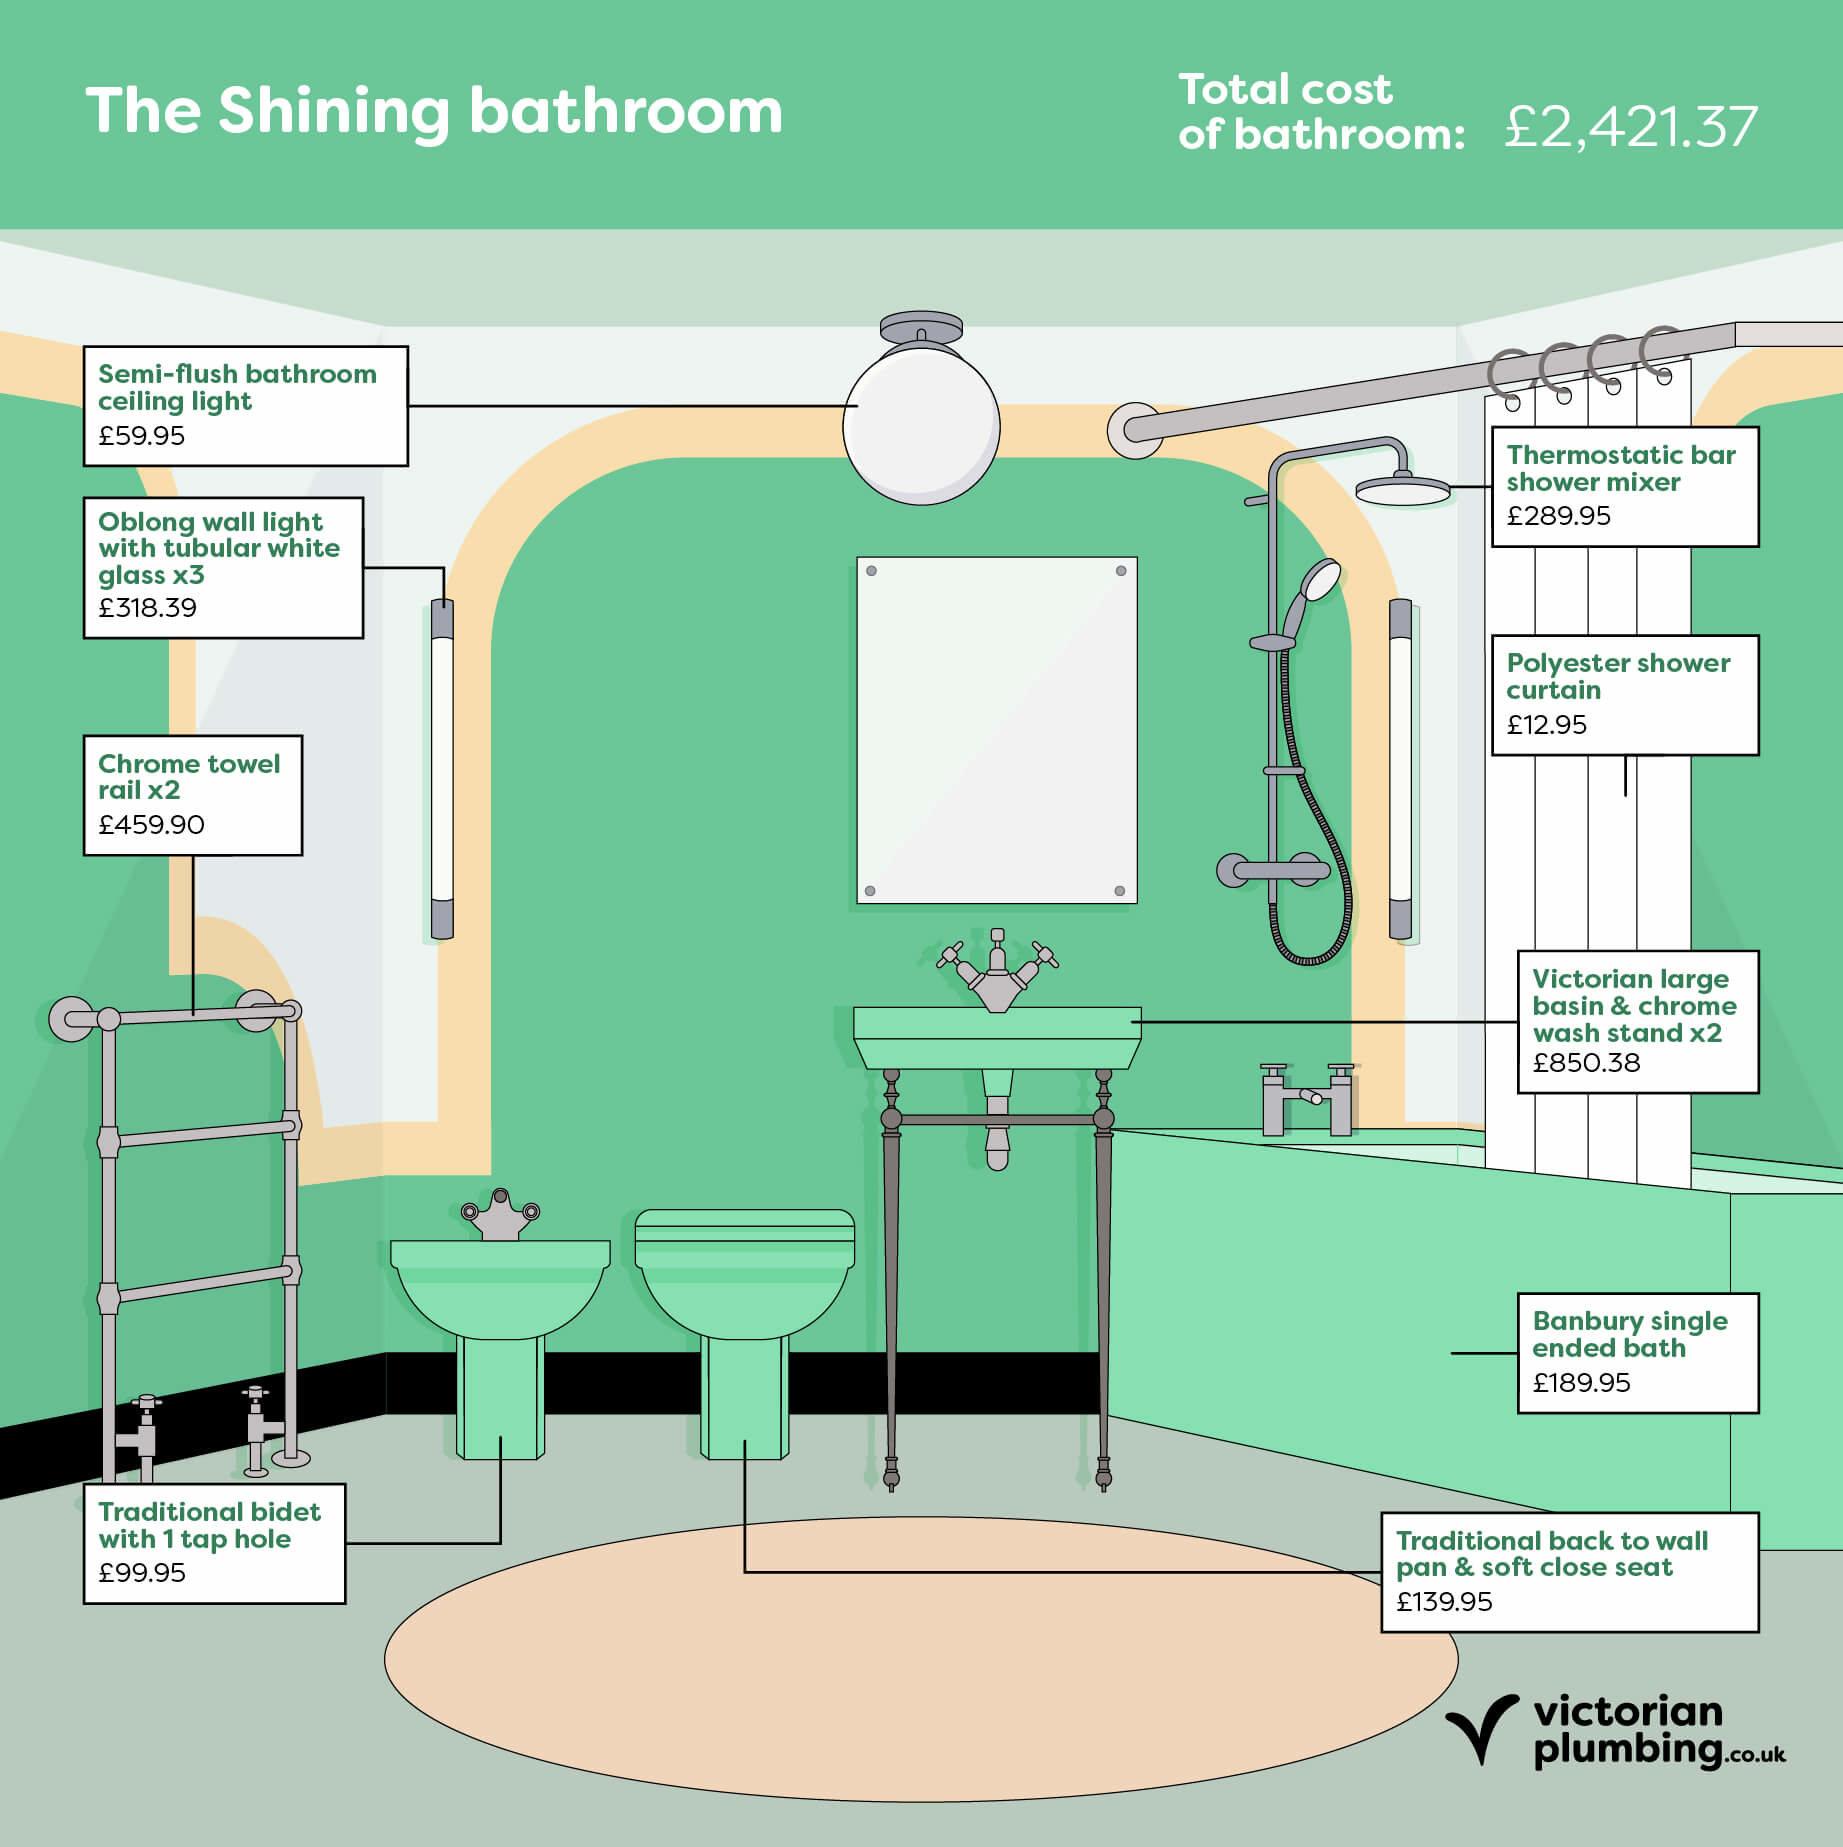 Fictional Bathrooms: The Shining